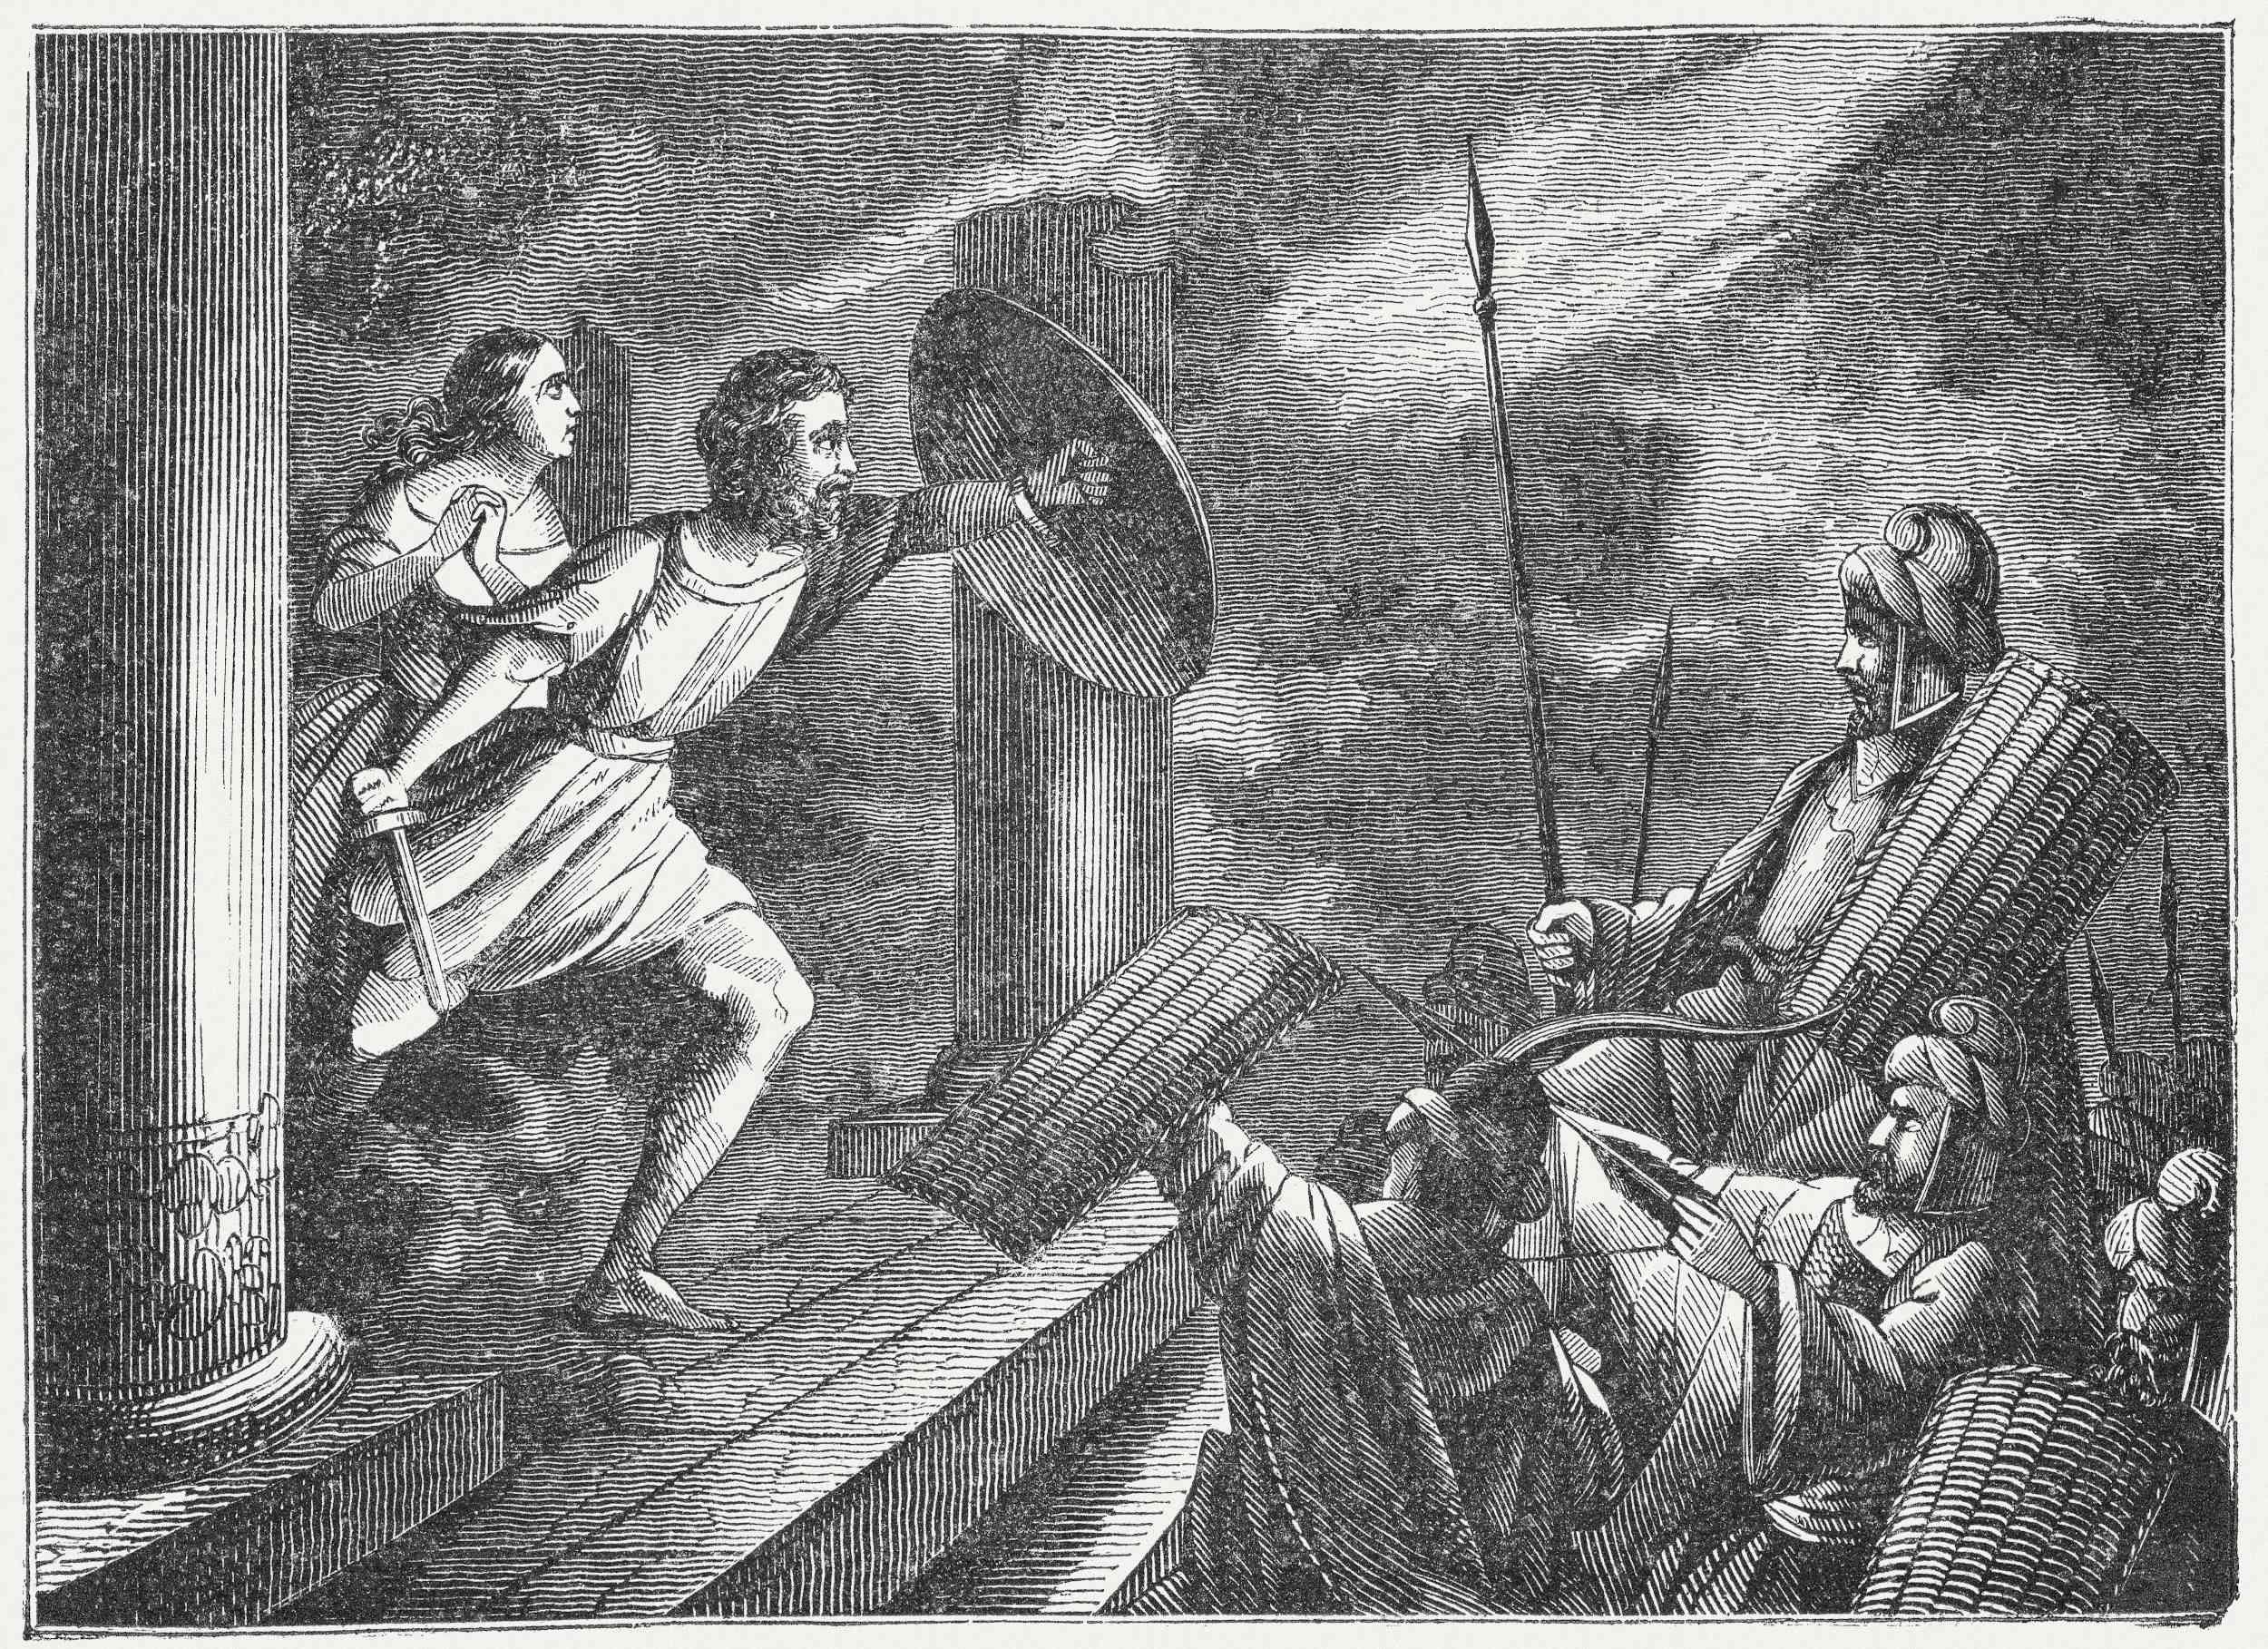 Death of Alcibiades (404 BC), 19th century wood engraving